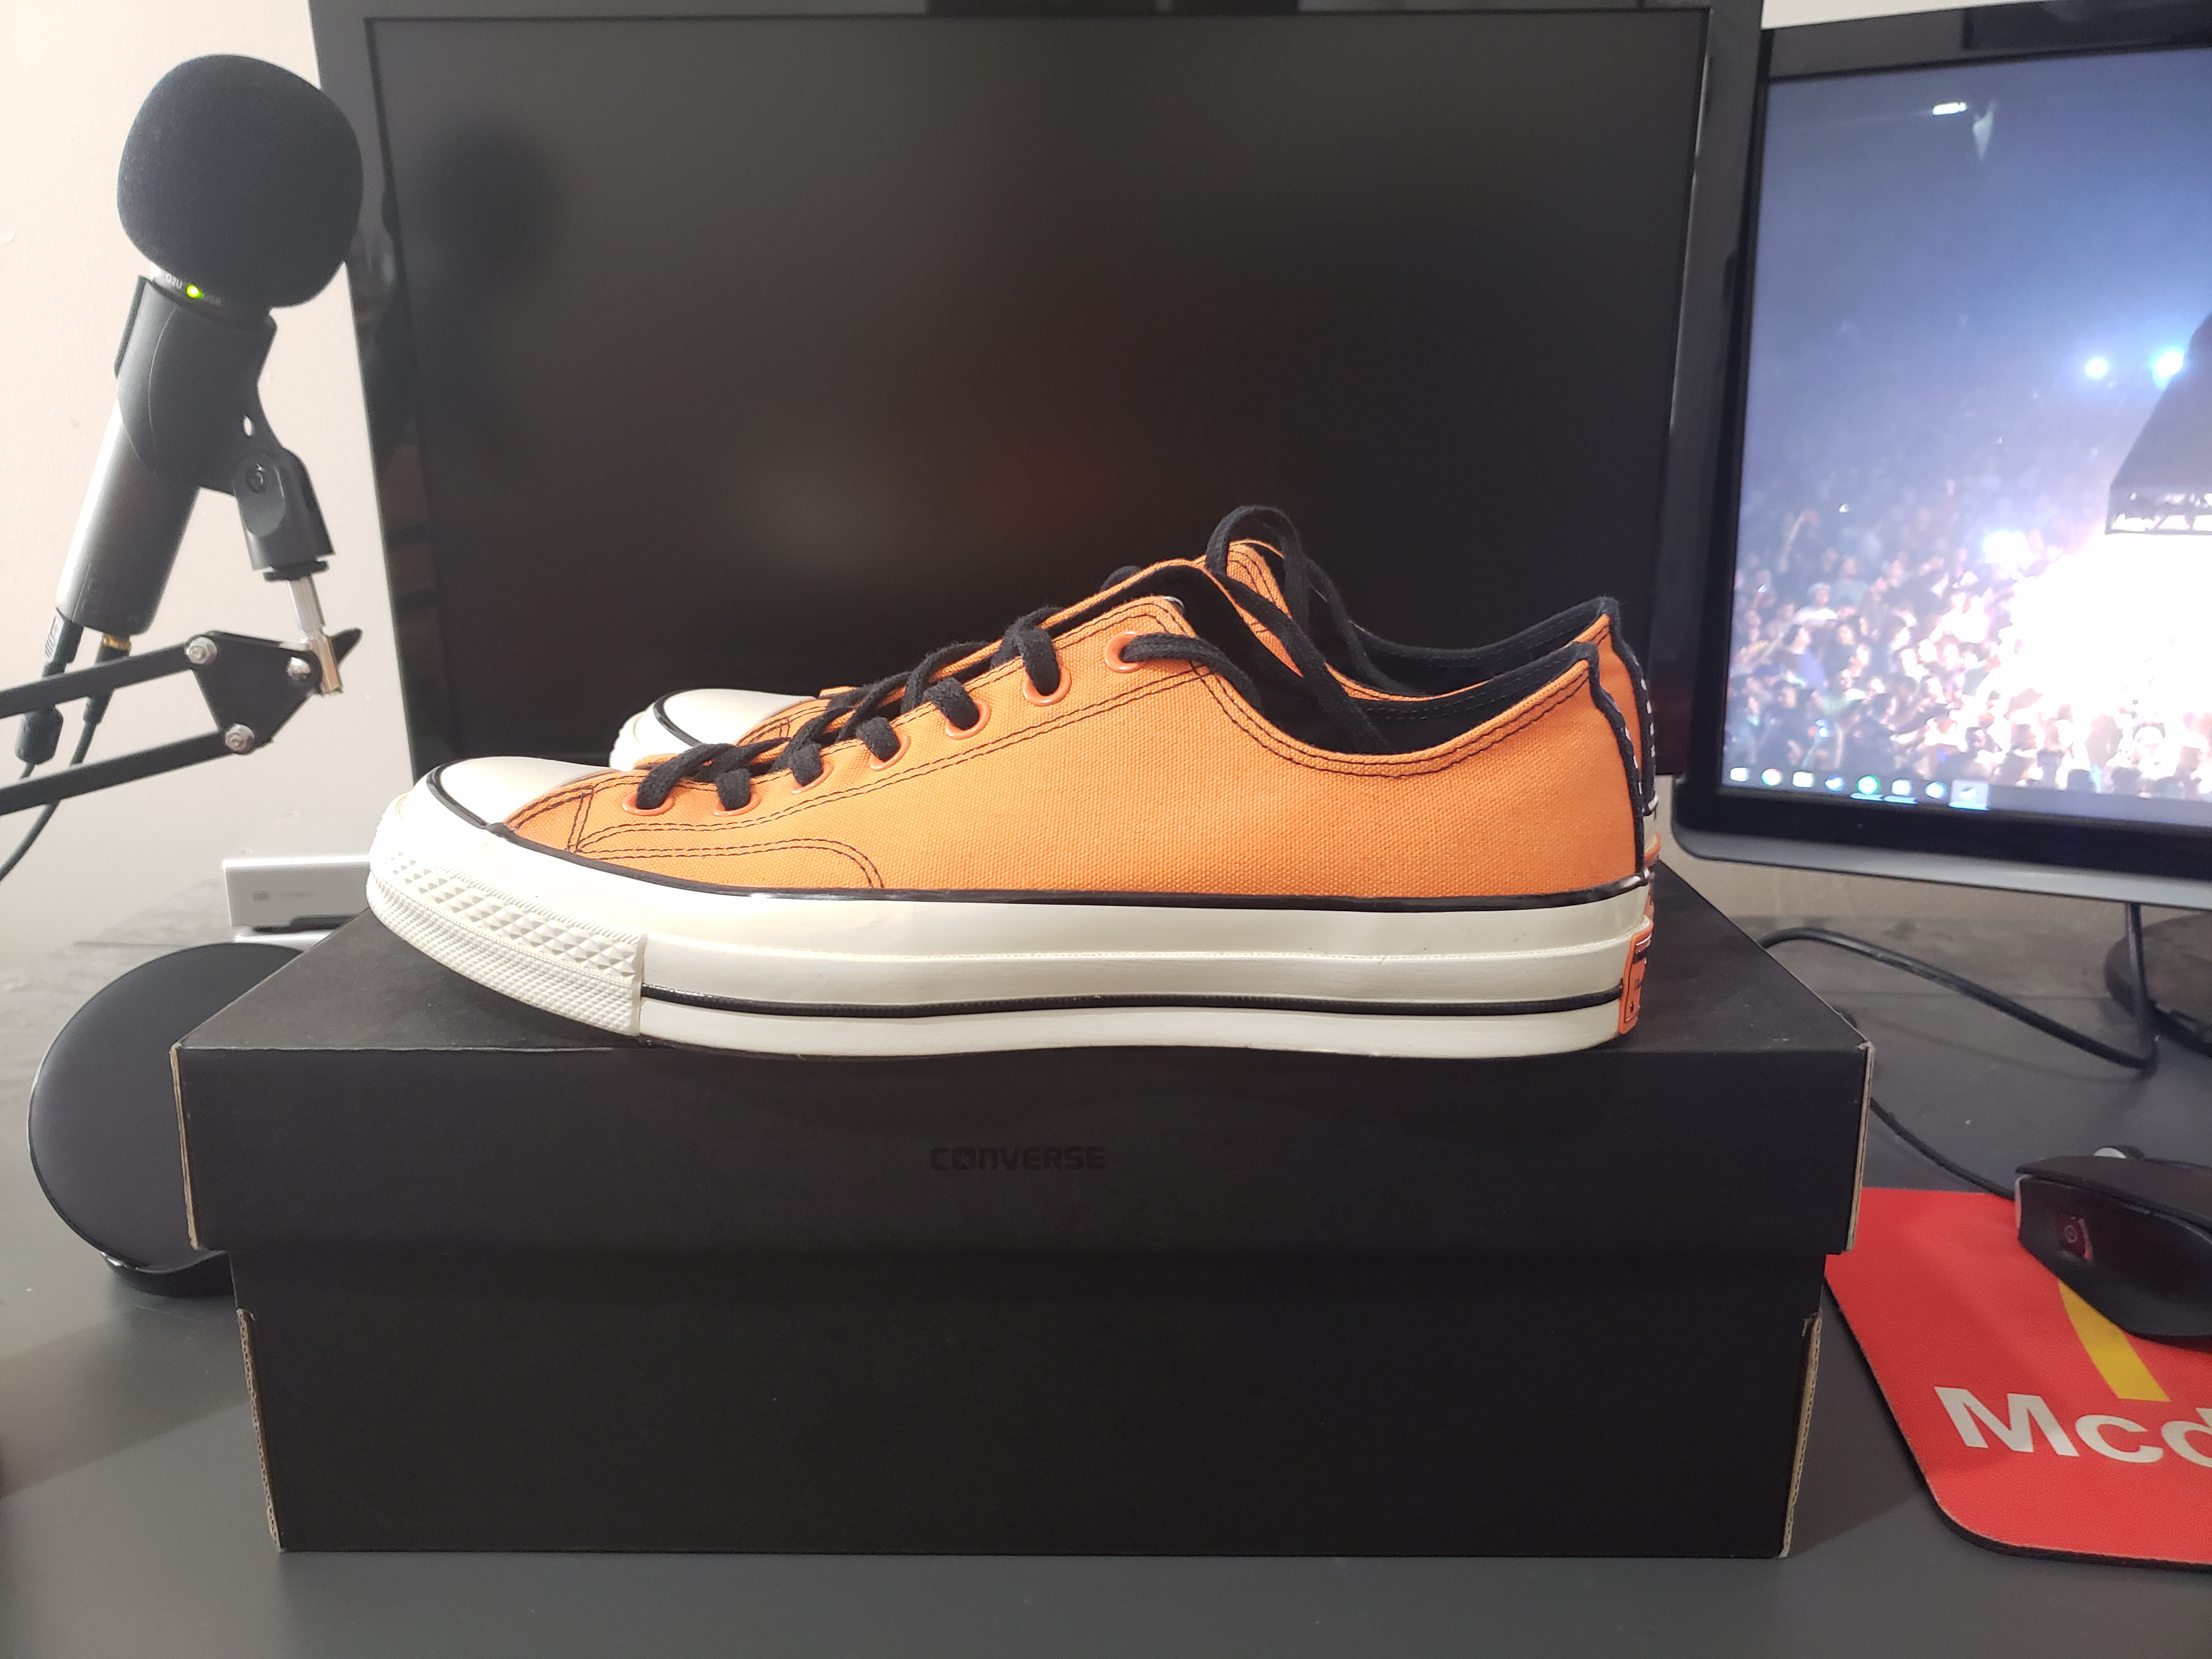 innovative design ec0f0 26667 Converse × Vince Staples Merch ×. Converse Chuck Taylor All-Star 70s Ox  Vince Staples Orange